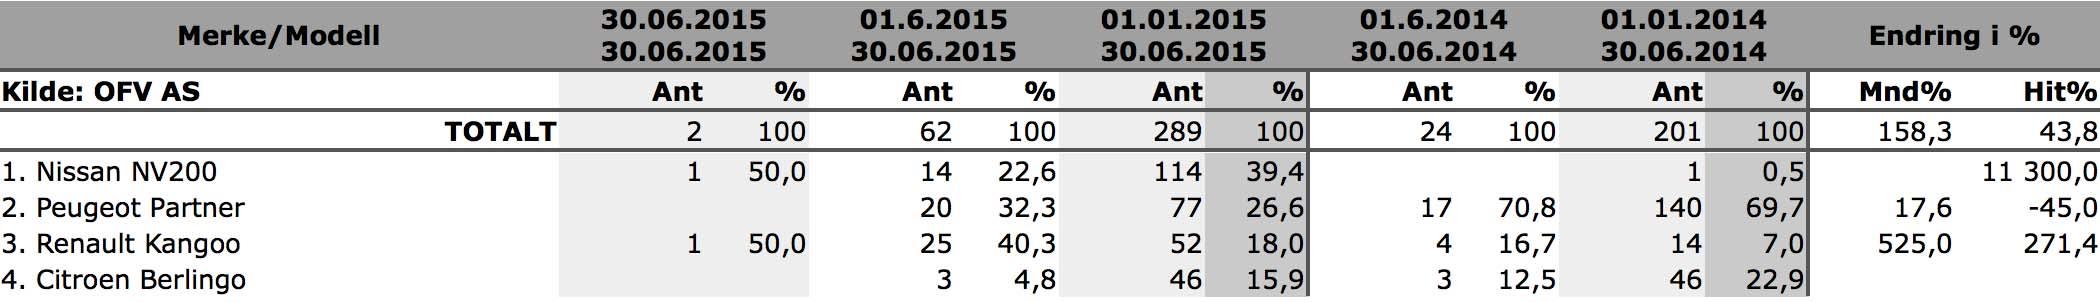 blogg-20150702-elvarebil stats 800